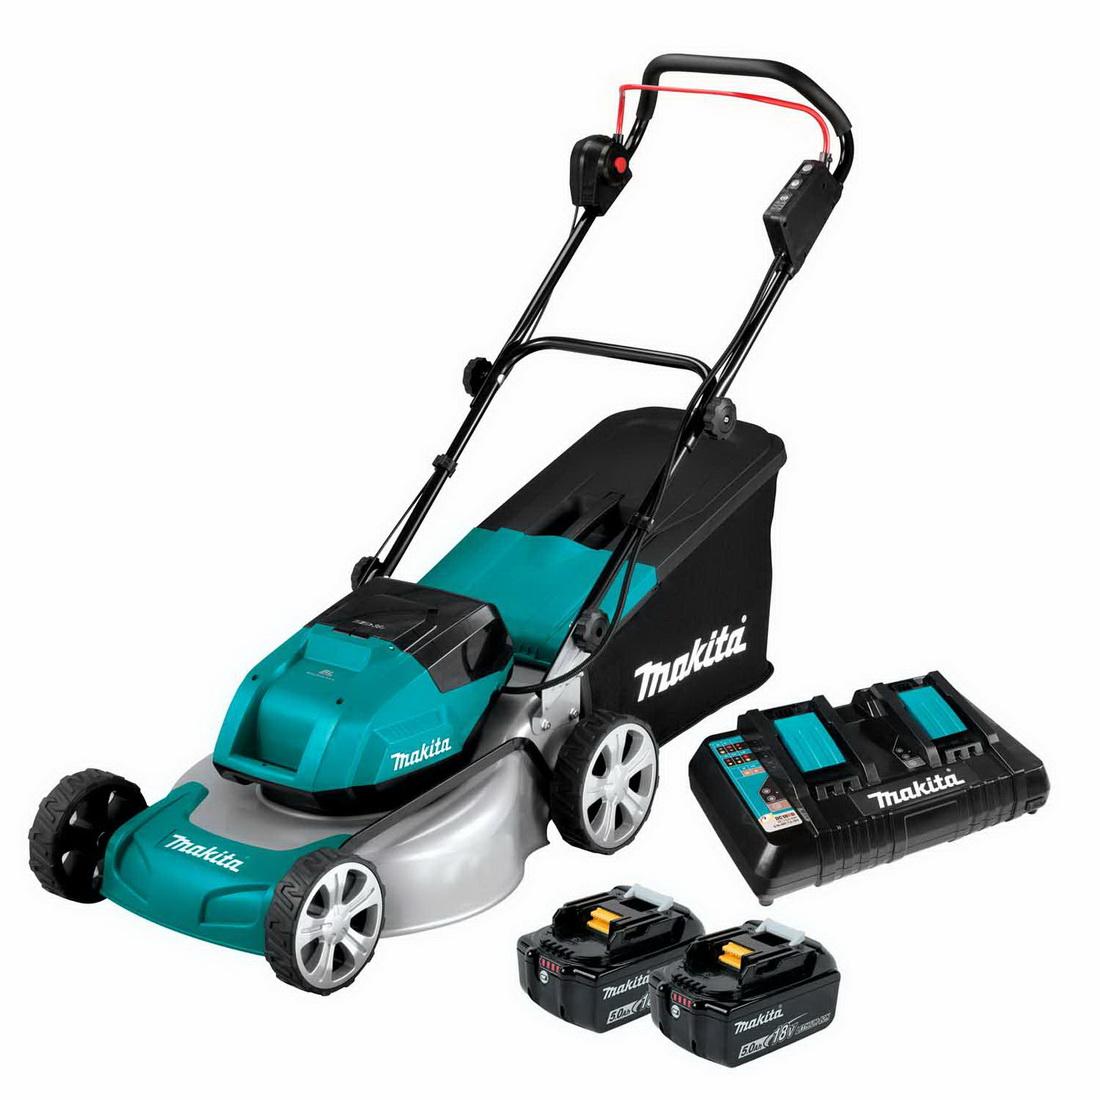 2 x 18V 5Ah 460mm Lxt Brushless Cordless Metal Deck Lawn Mower